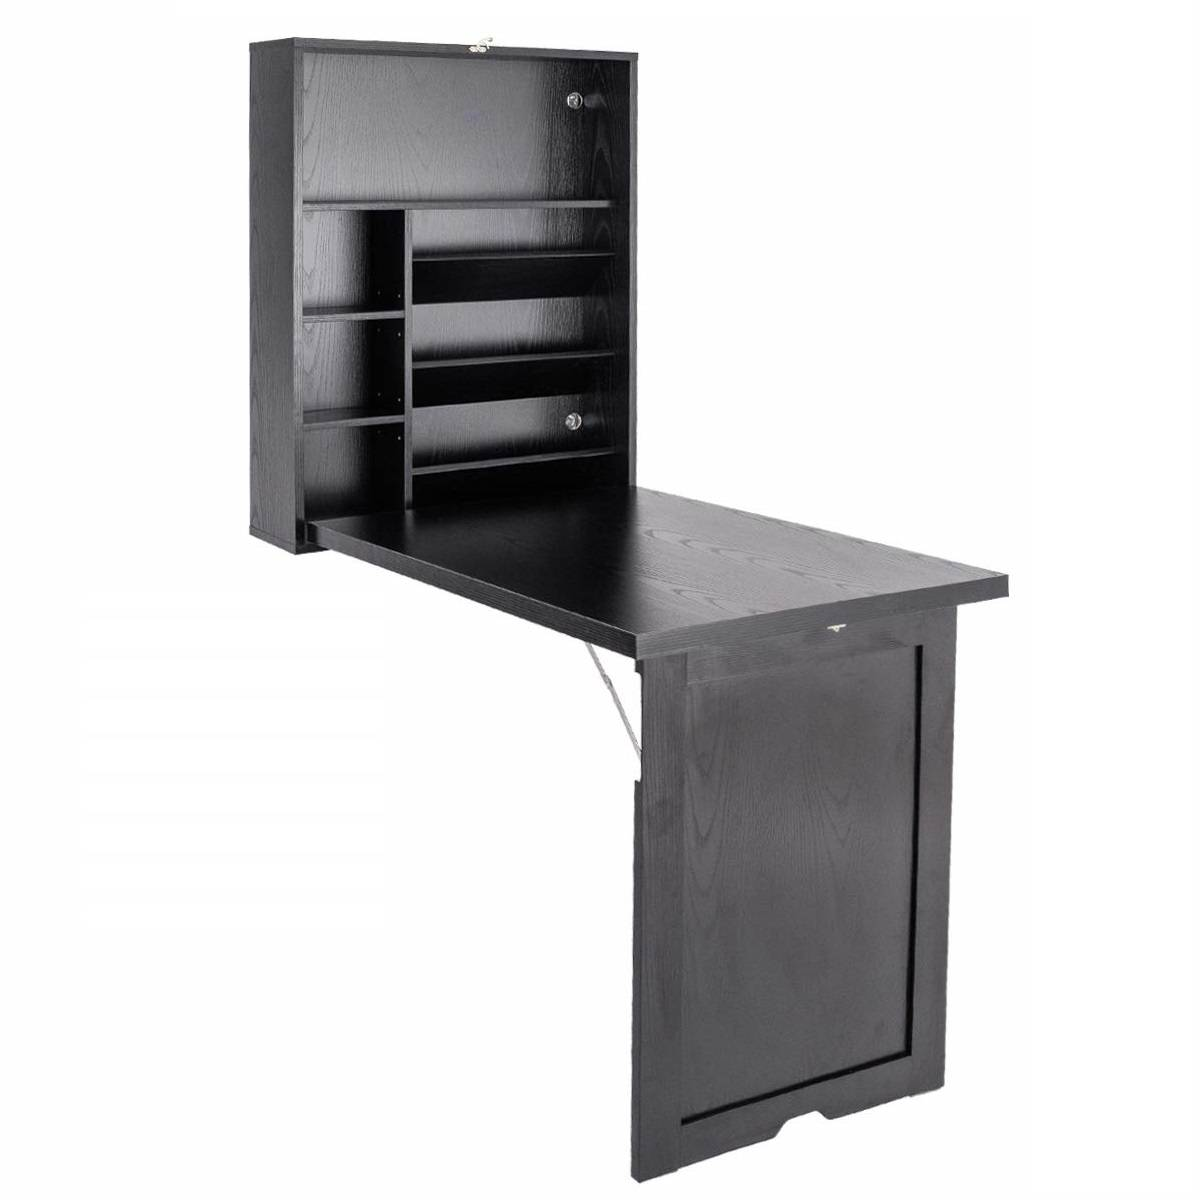 Costway Mesa de Ordenador de Pared Plegable Escritorio de Madera Portátil 151 x 94 5 x 56 5 cm Negro